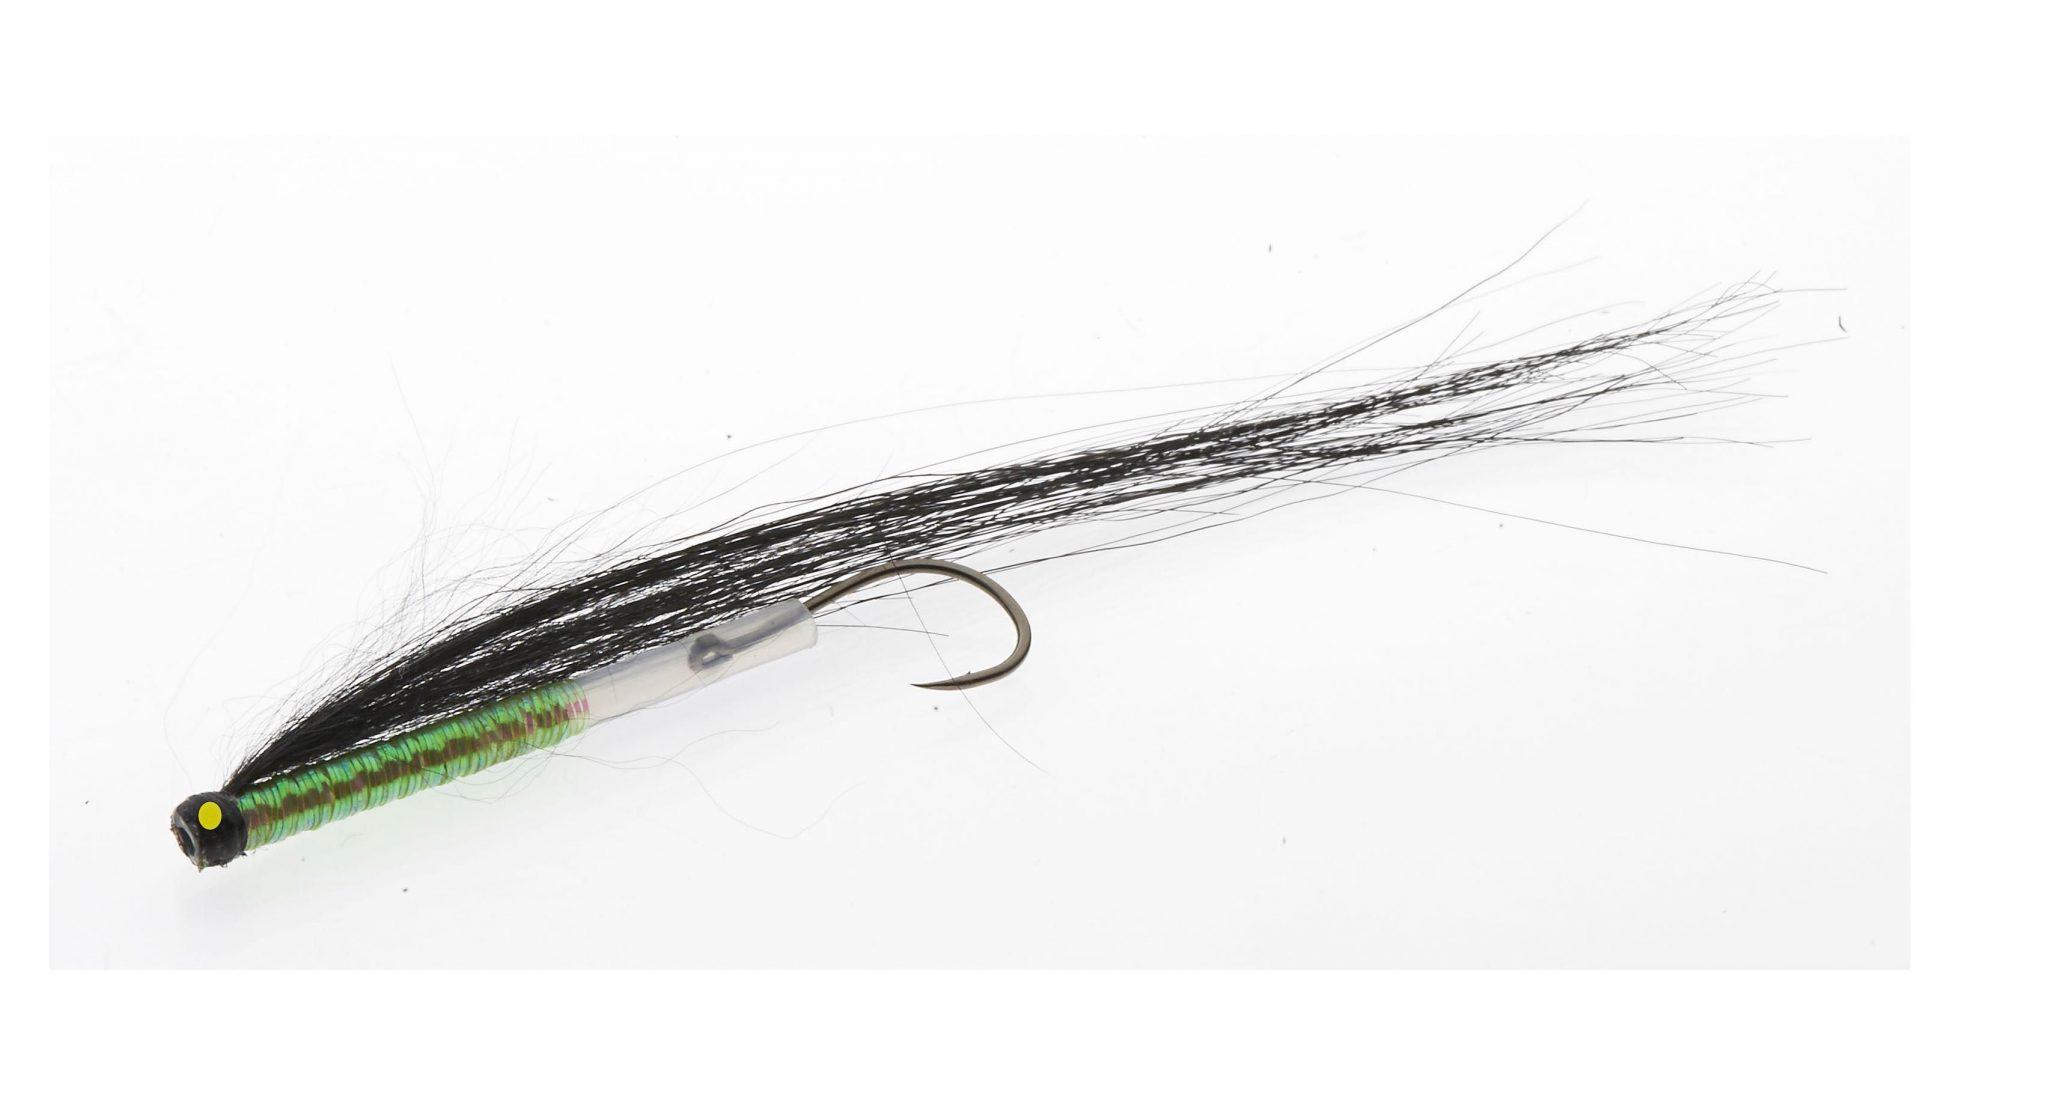 long winged tube fly